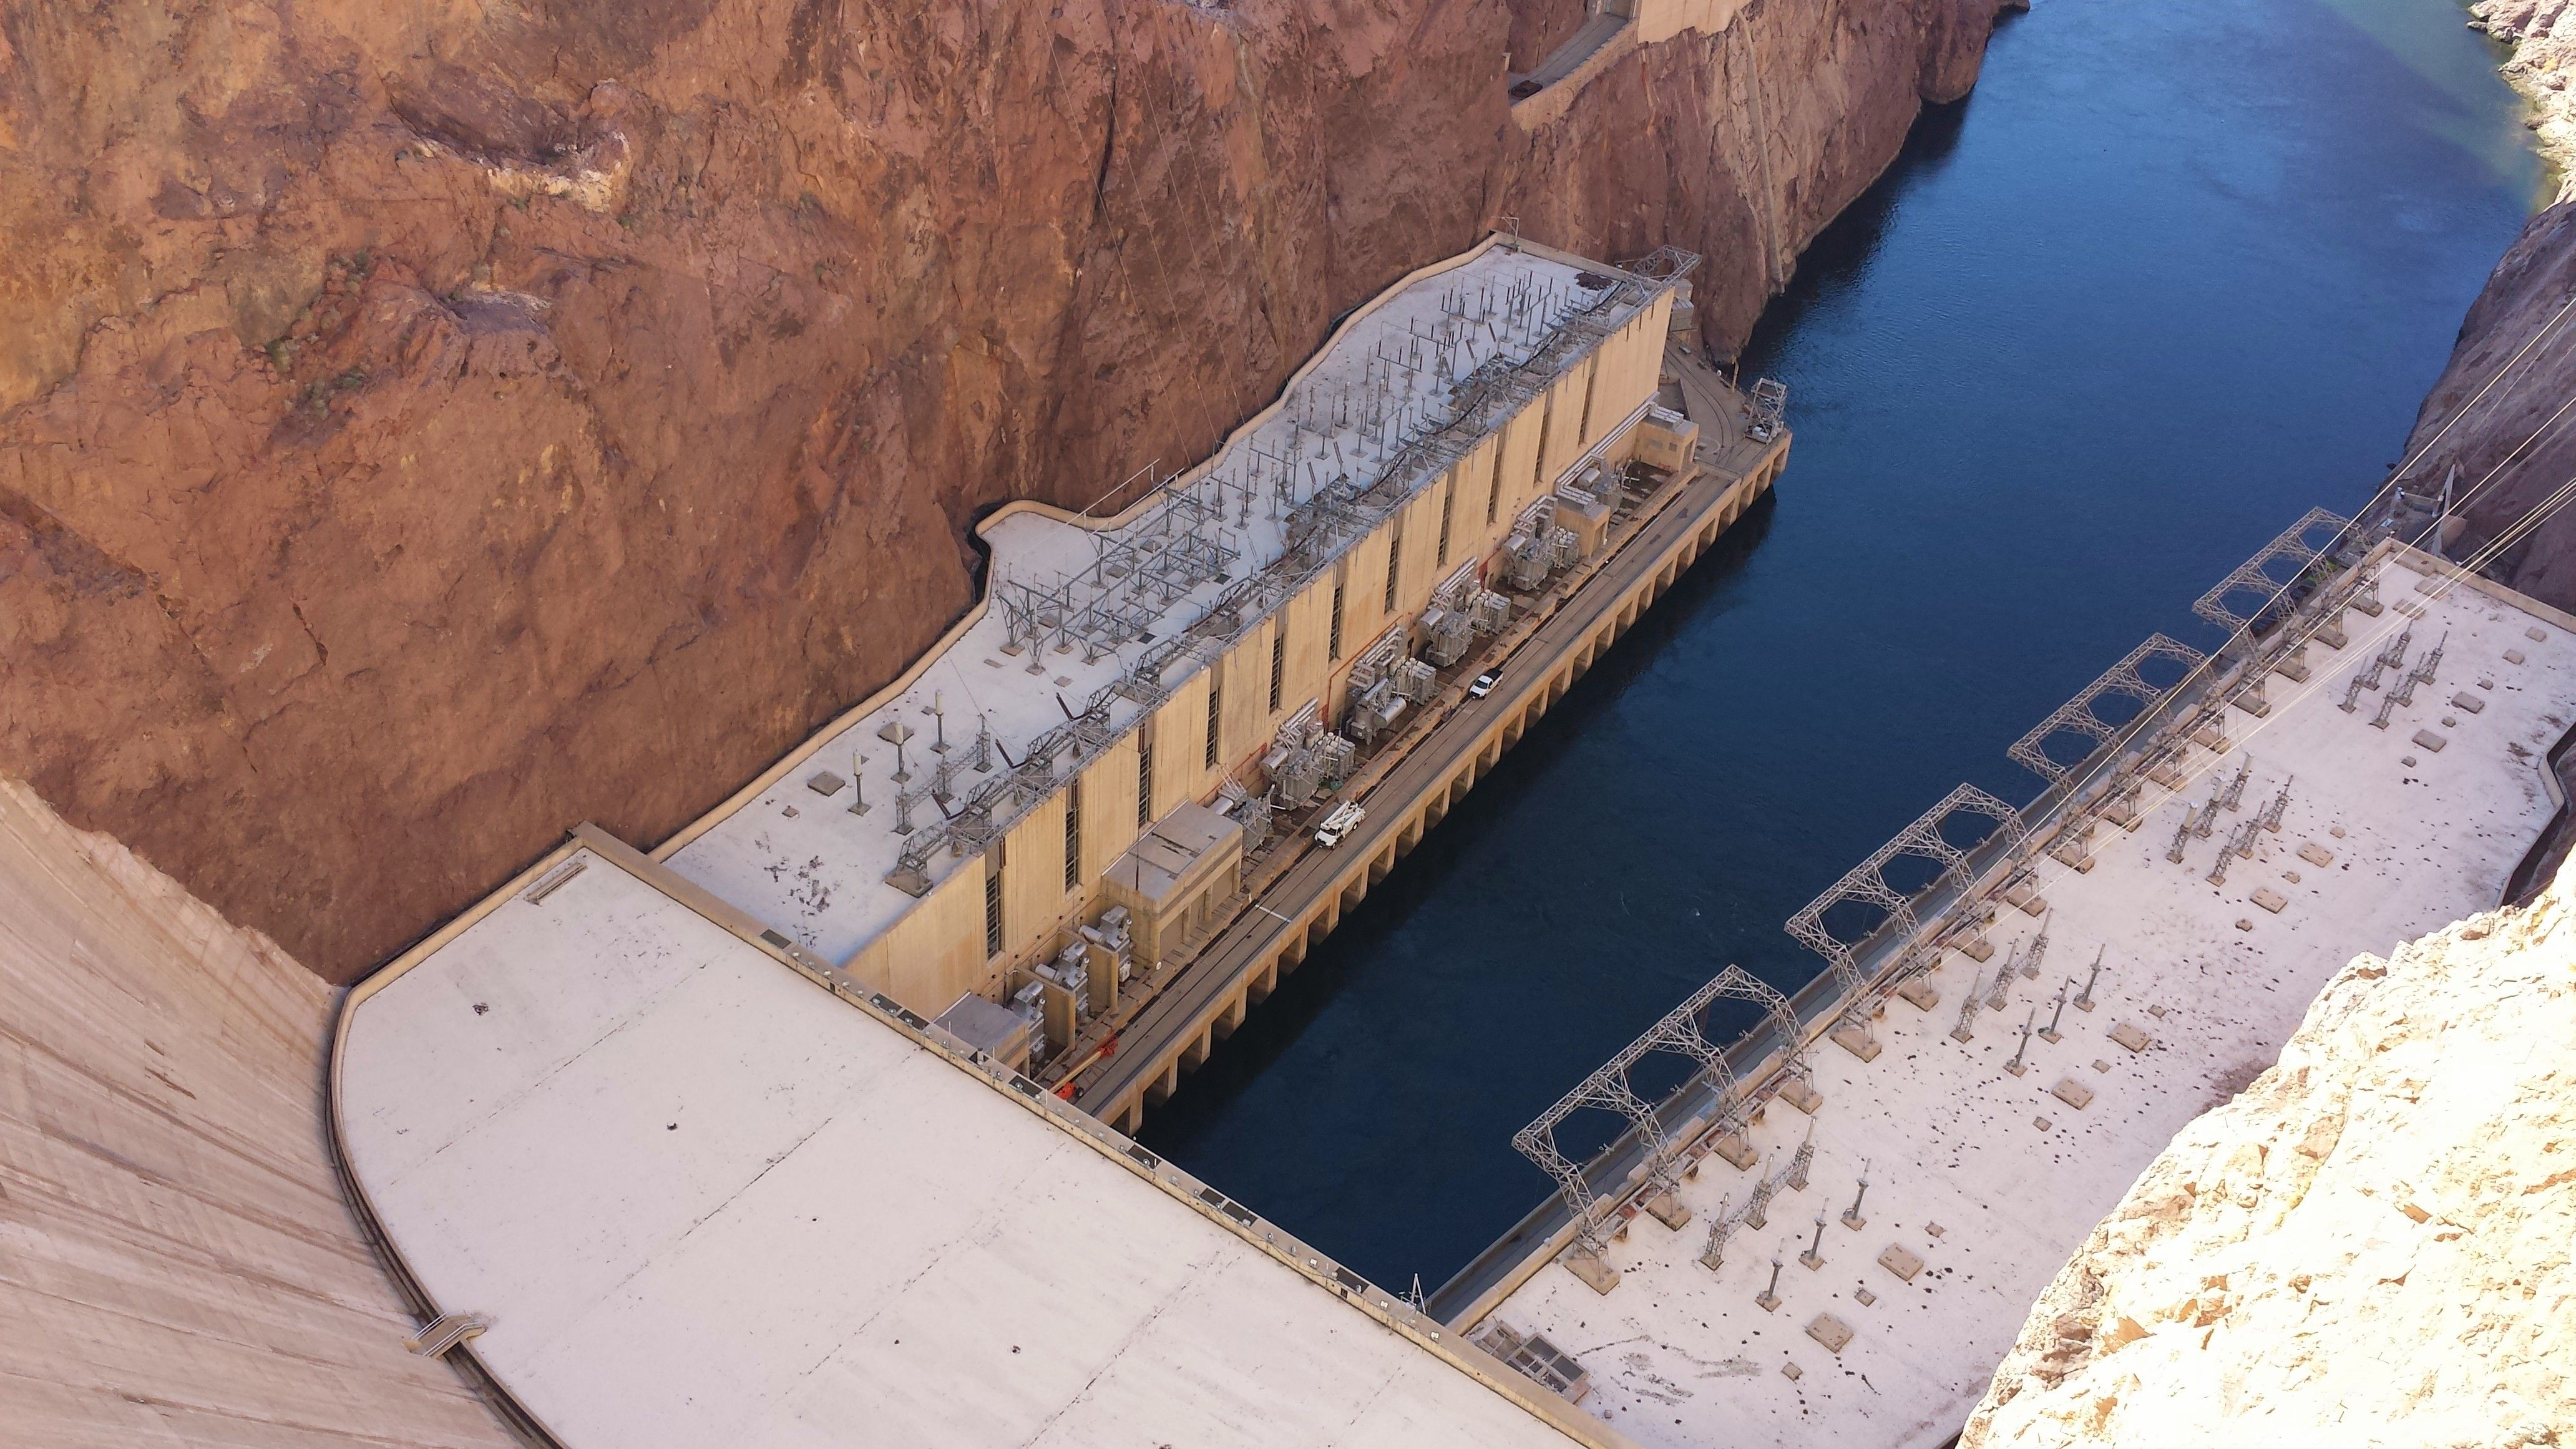 Hoover Dam #미국여행 #라스베가스 #후버댐